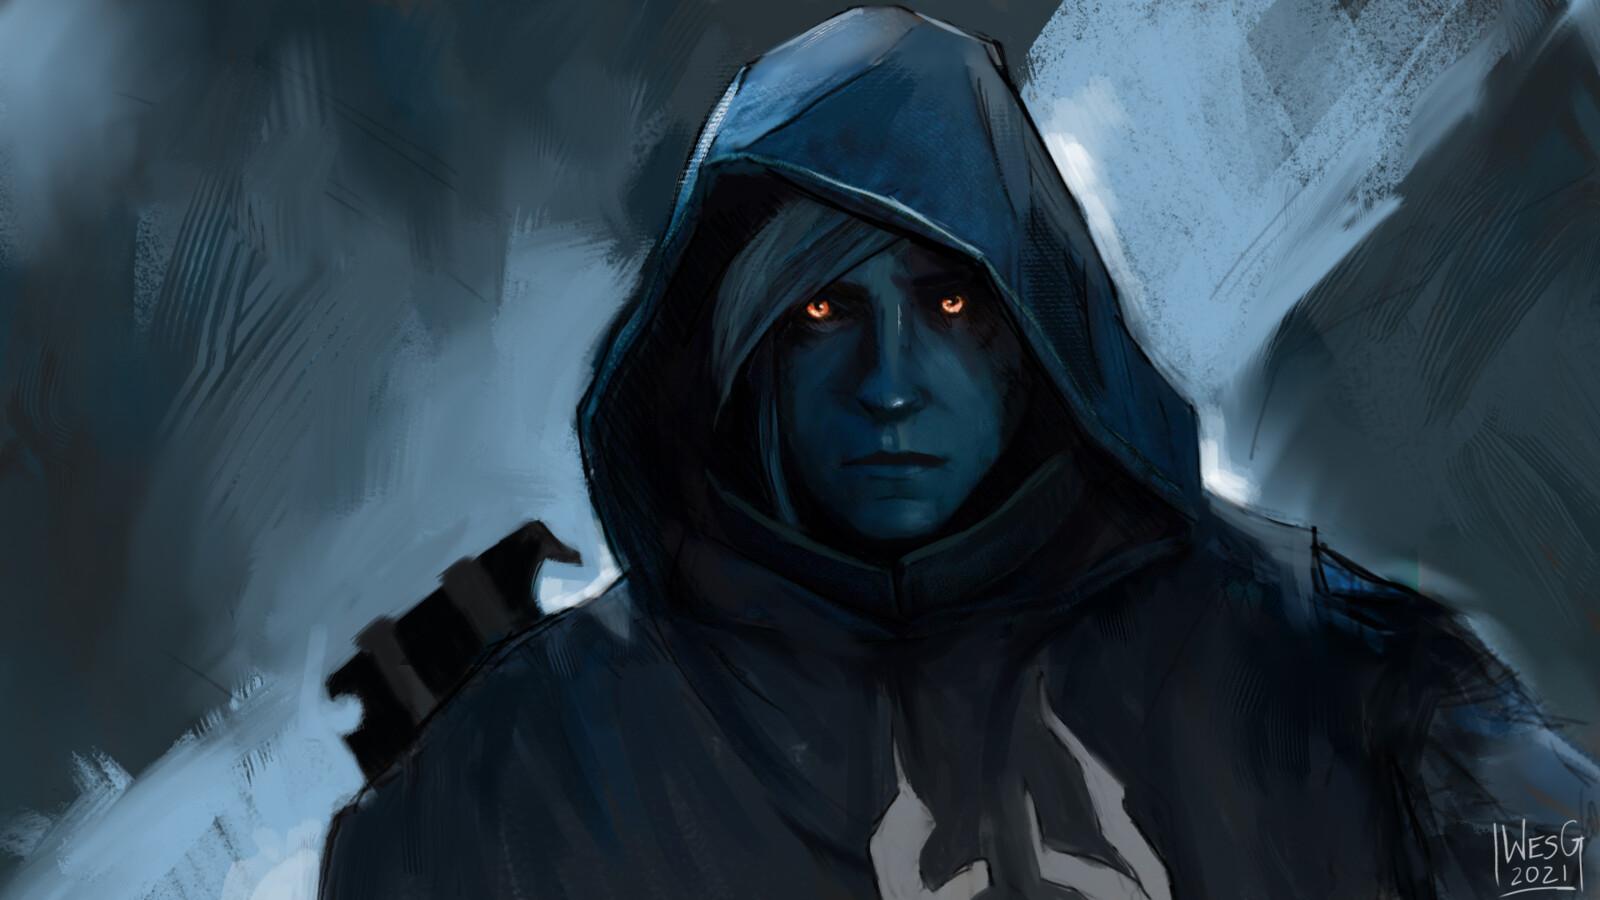 Uldron Sov - The Crow (Destiny 2 Fan Art)